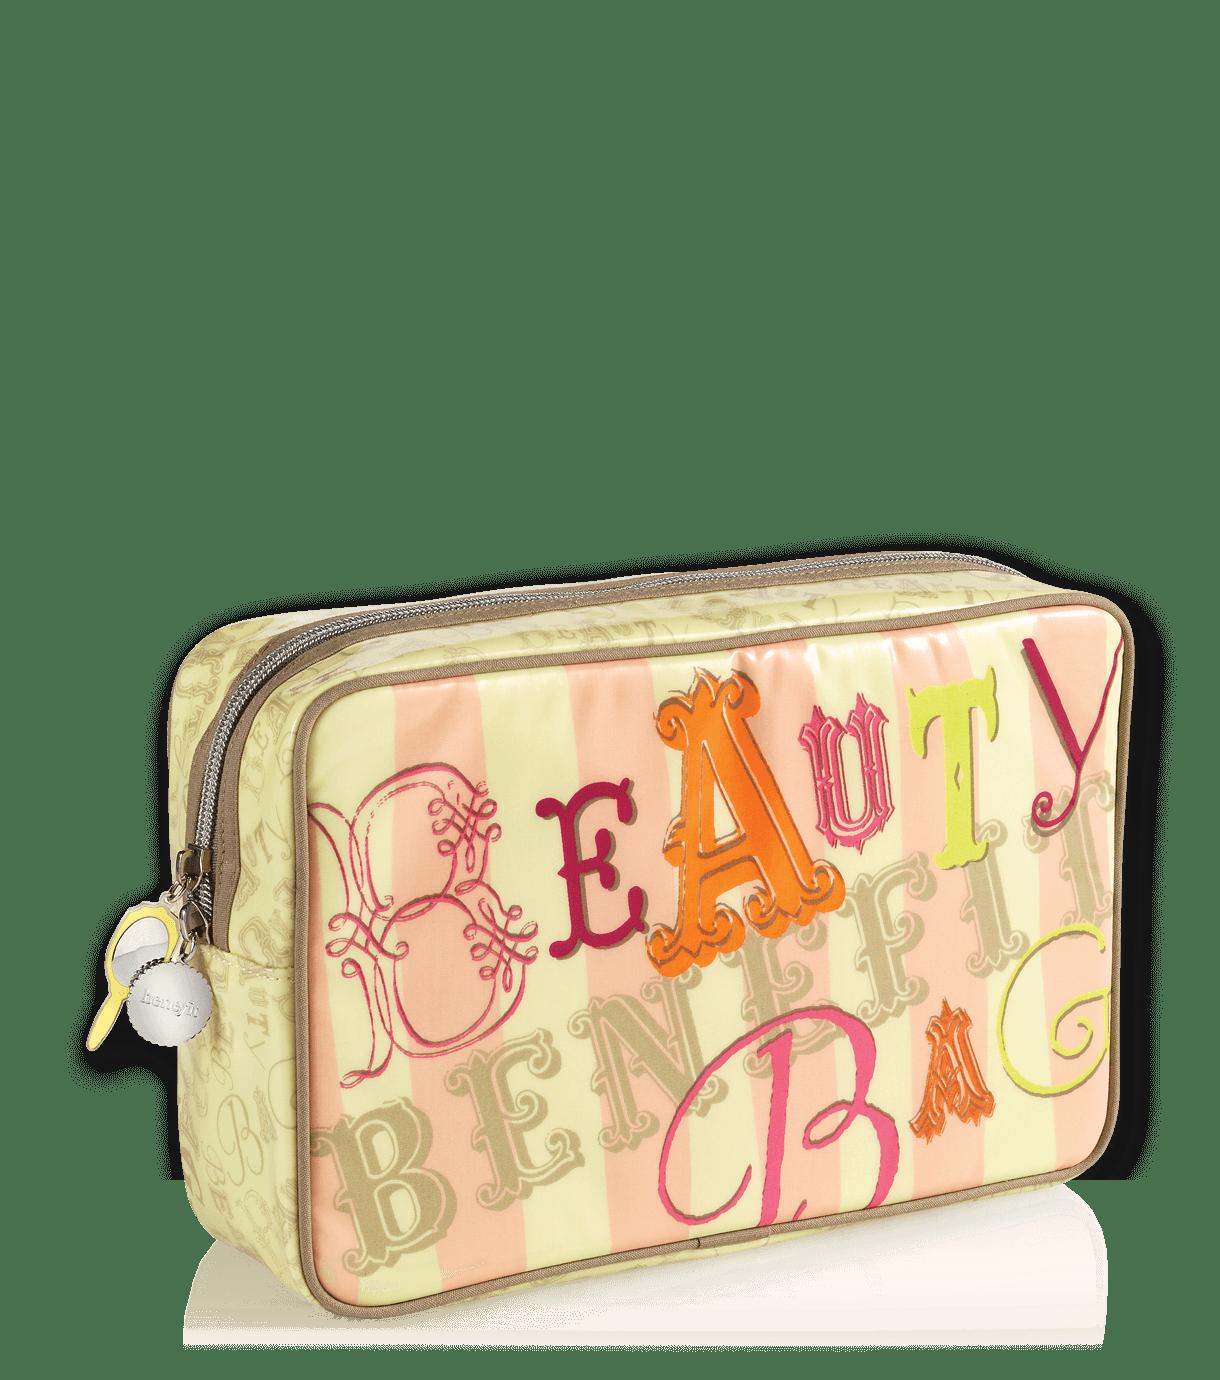 Benefit travel beauty kit